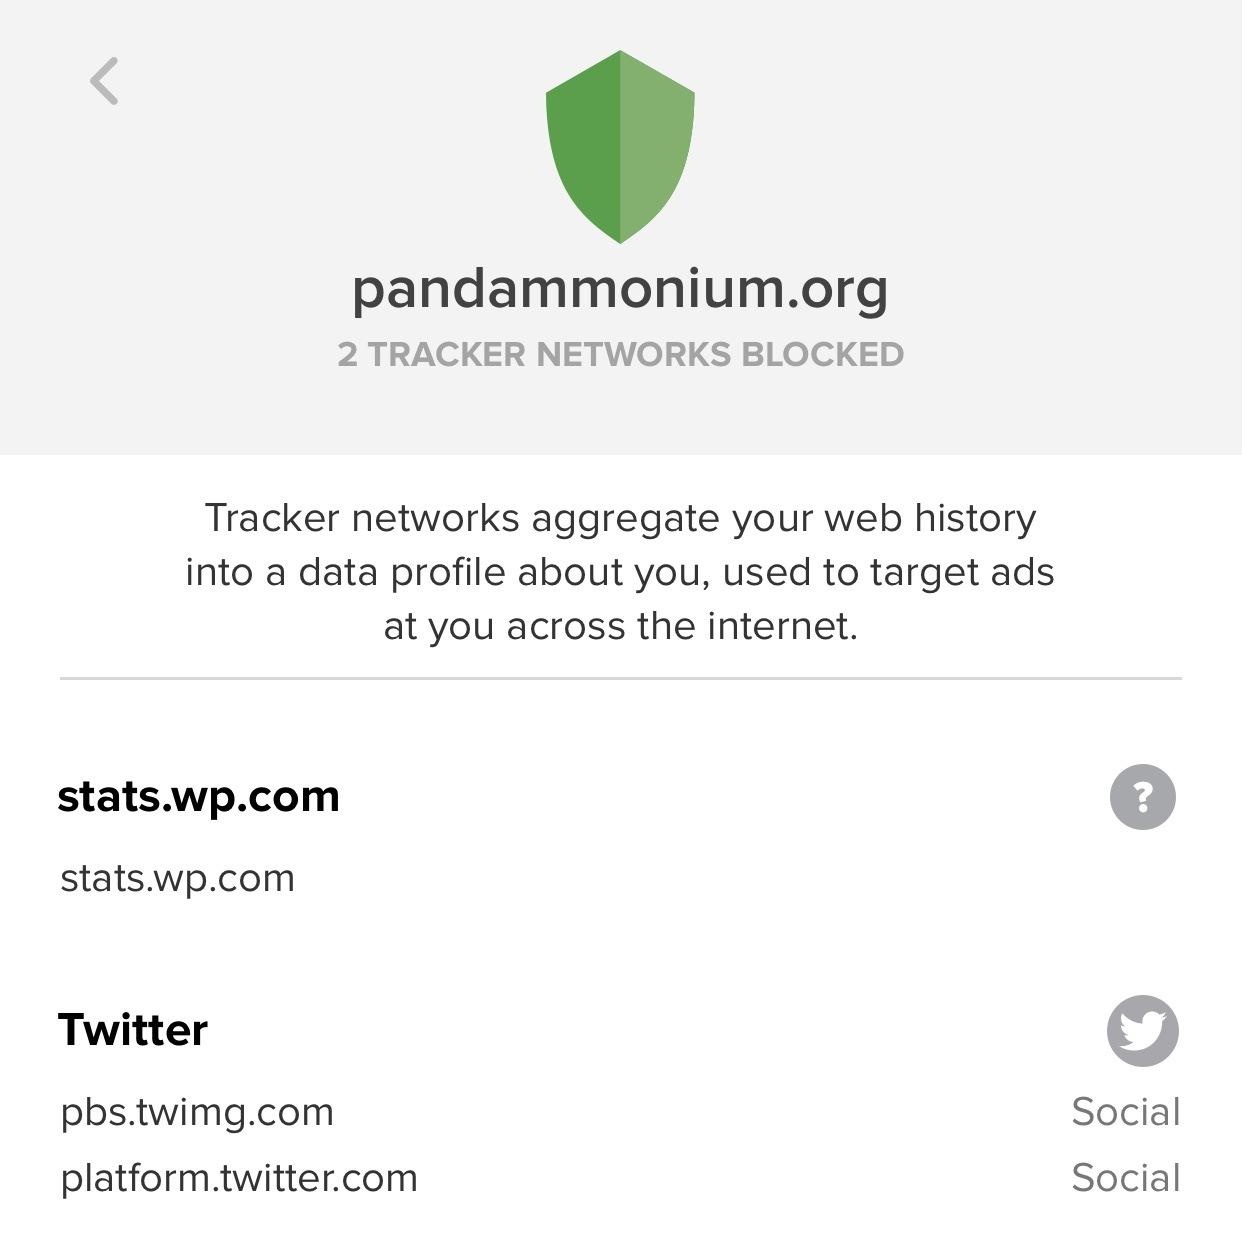 trackers on pandammonium.org